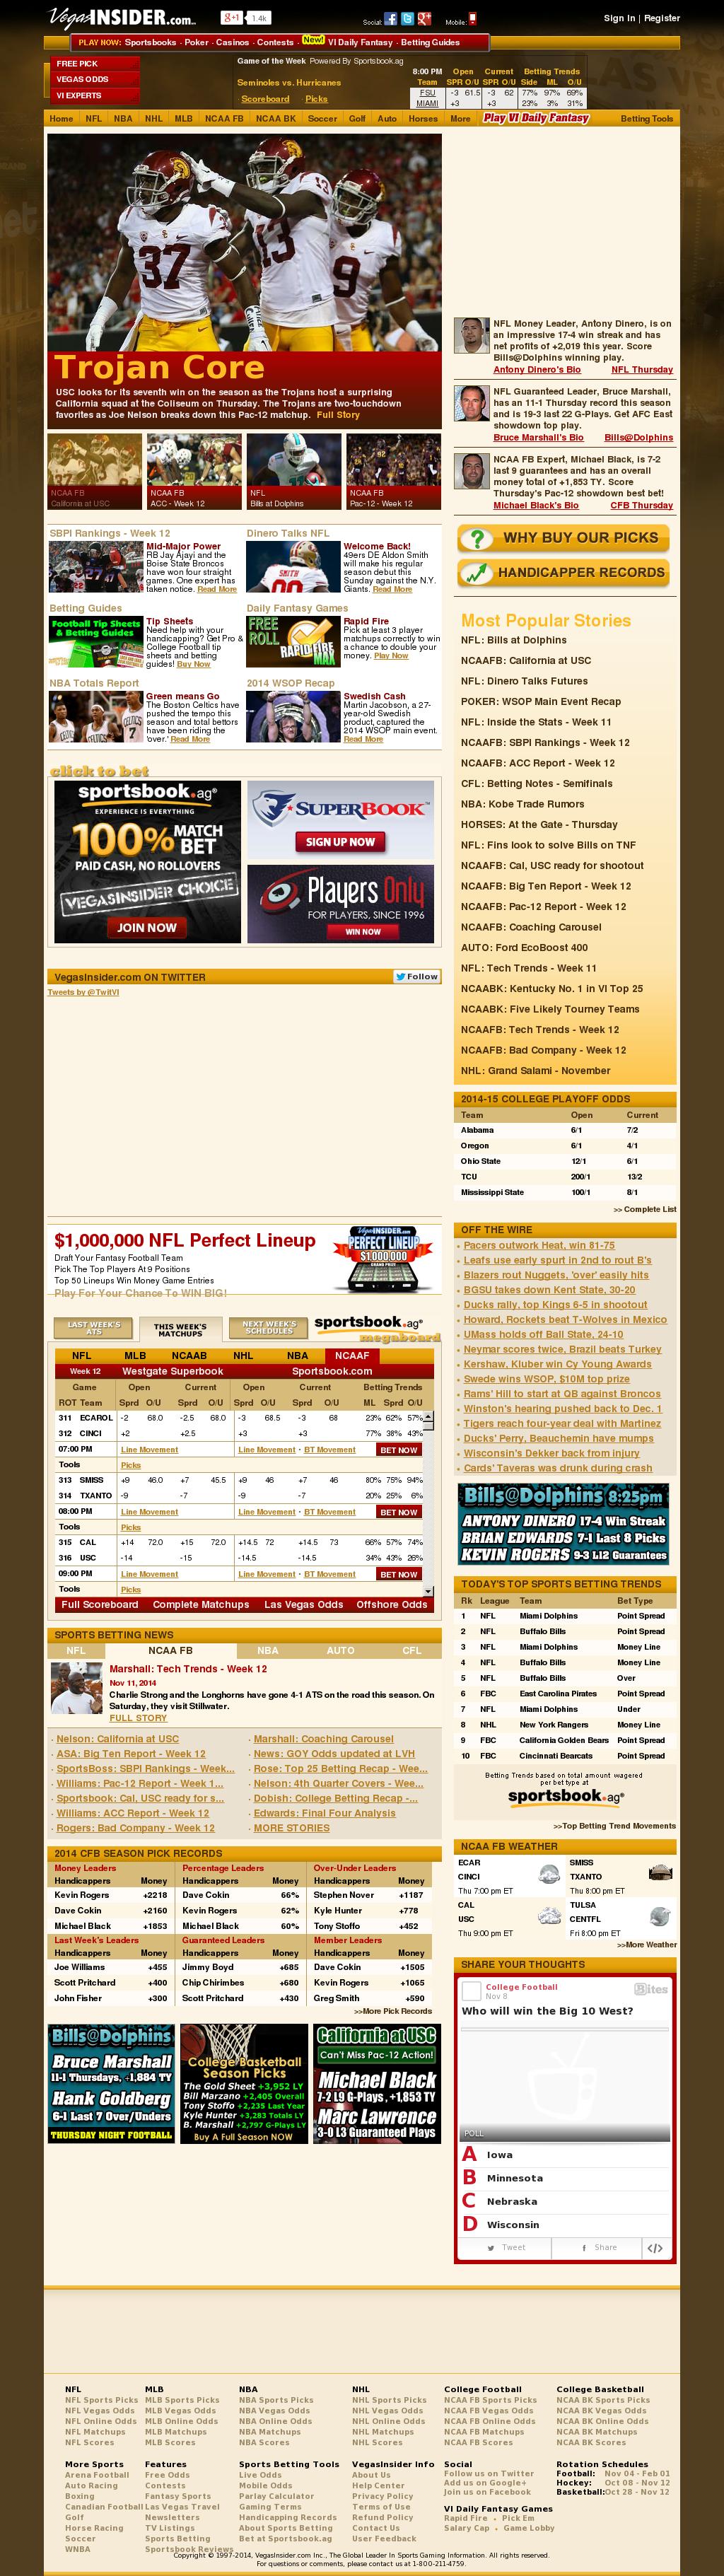 VegasInsider com Competitors, Revenue and Employees - Owler